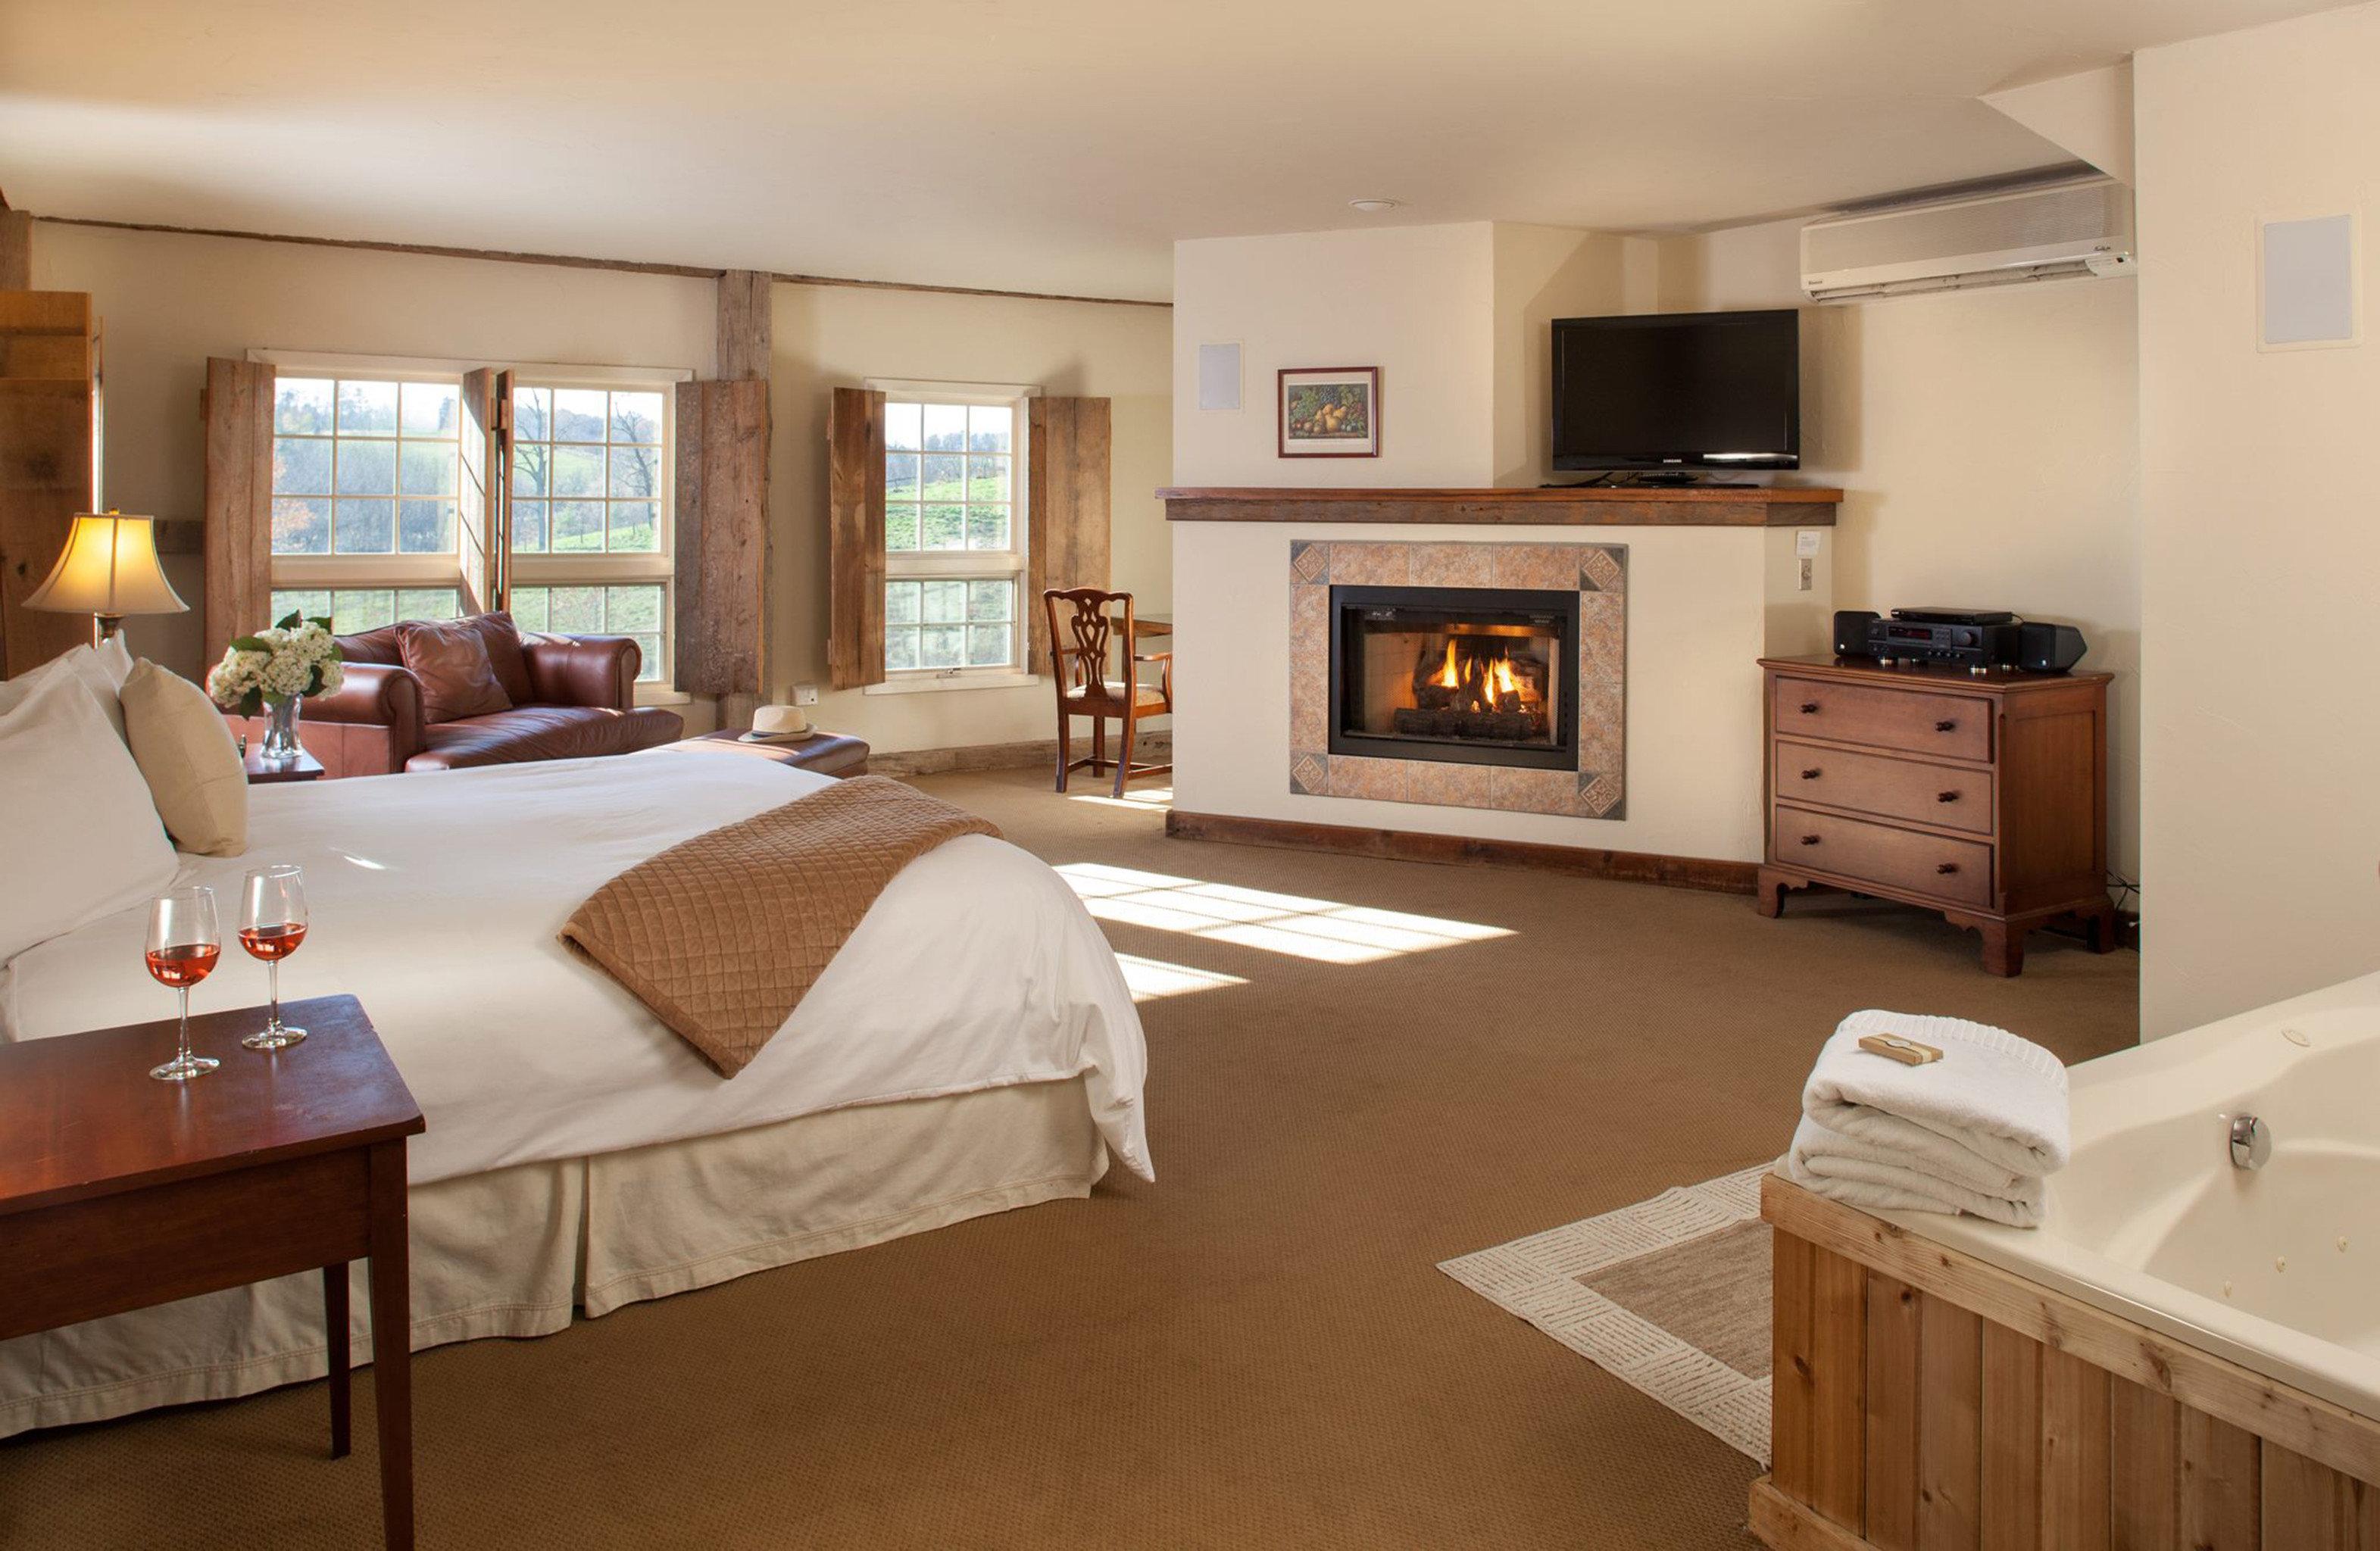 Bedroom Fireplace Inn Rustic property home Suite living room hardwood cottage condominium Villa